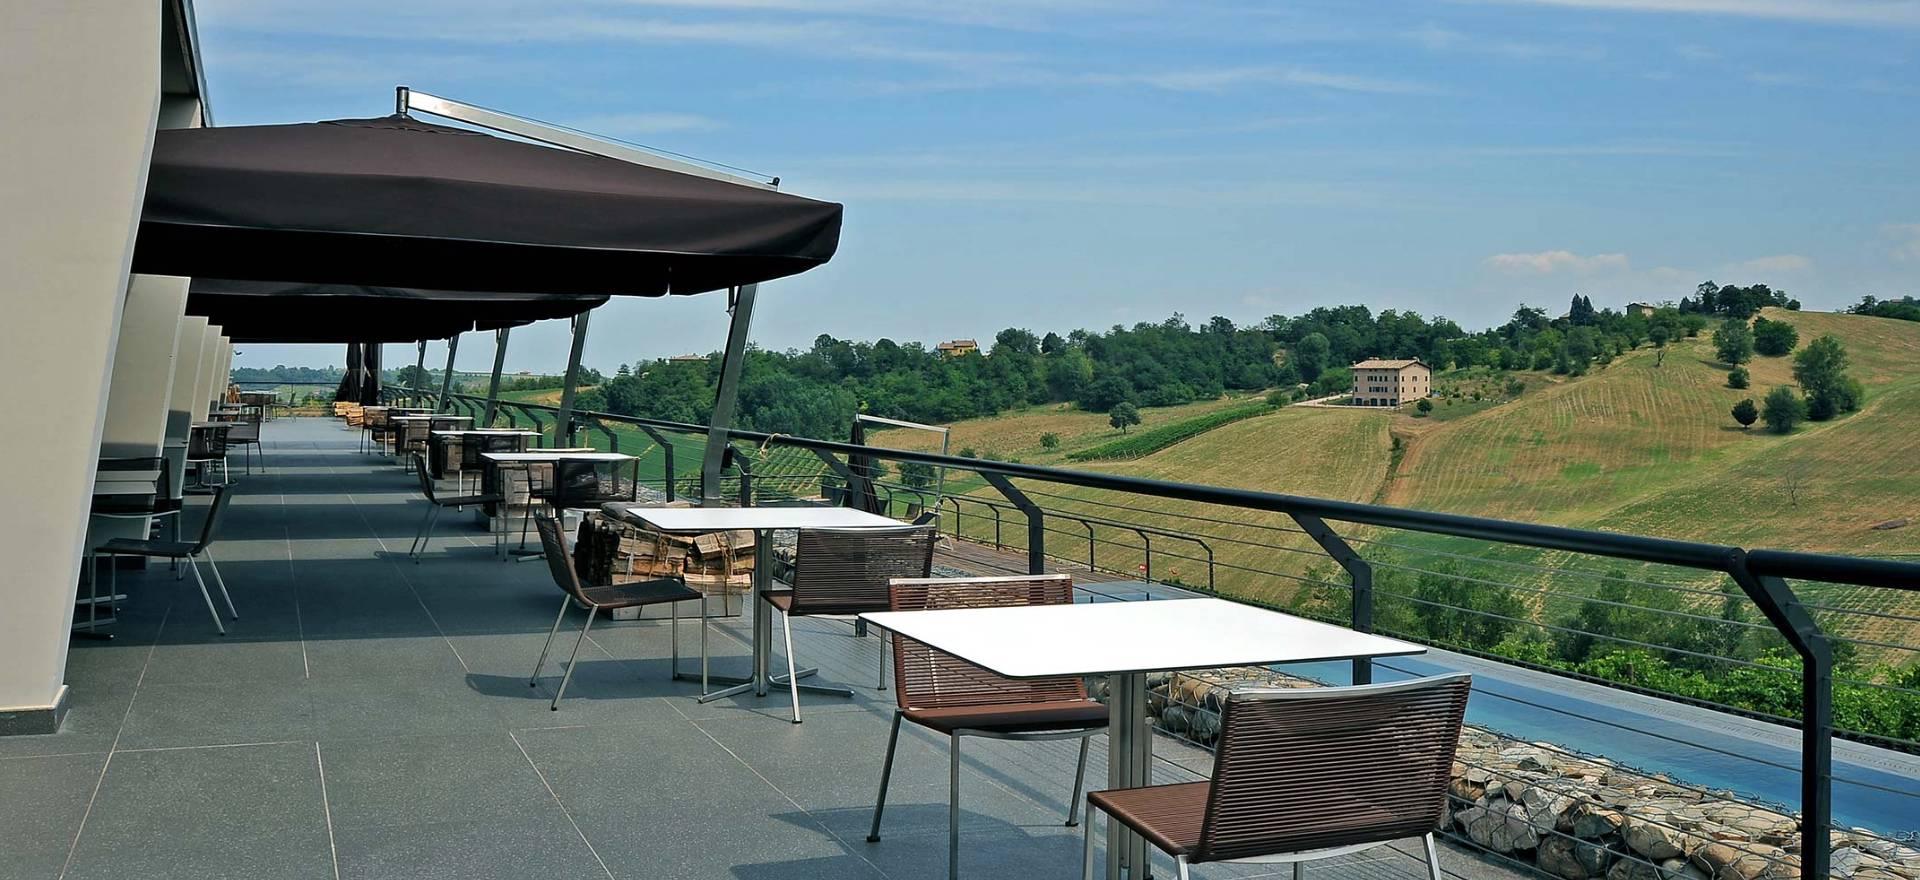 Agriturismo Emilia Romagna Agriturismo met ontspannen sfeer en goed restaurant